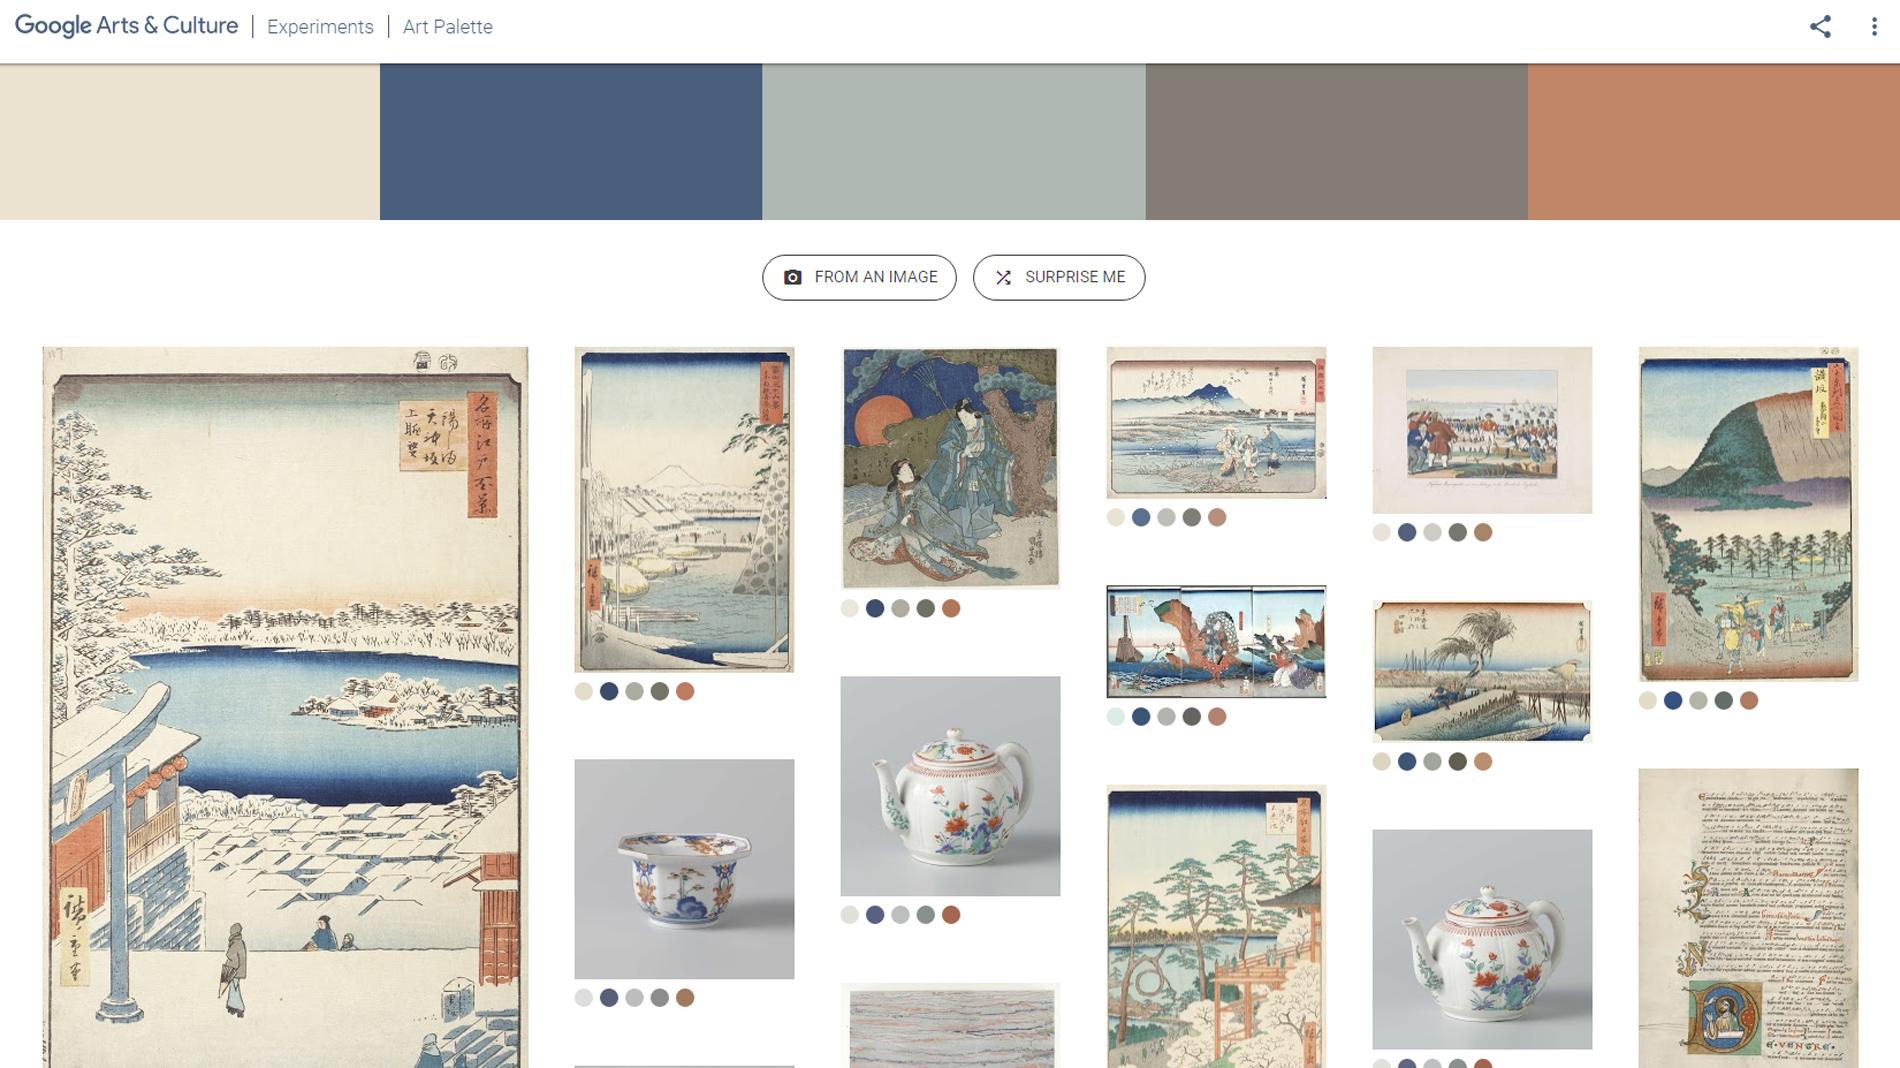 'Art Palette', el experimento de Google para localizar arte mediante inteligencia artificial